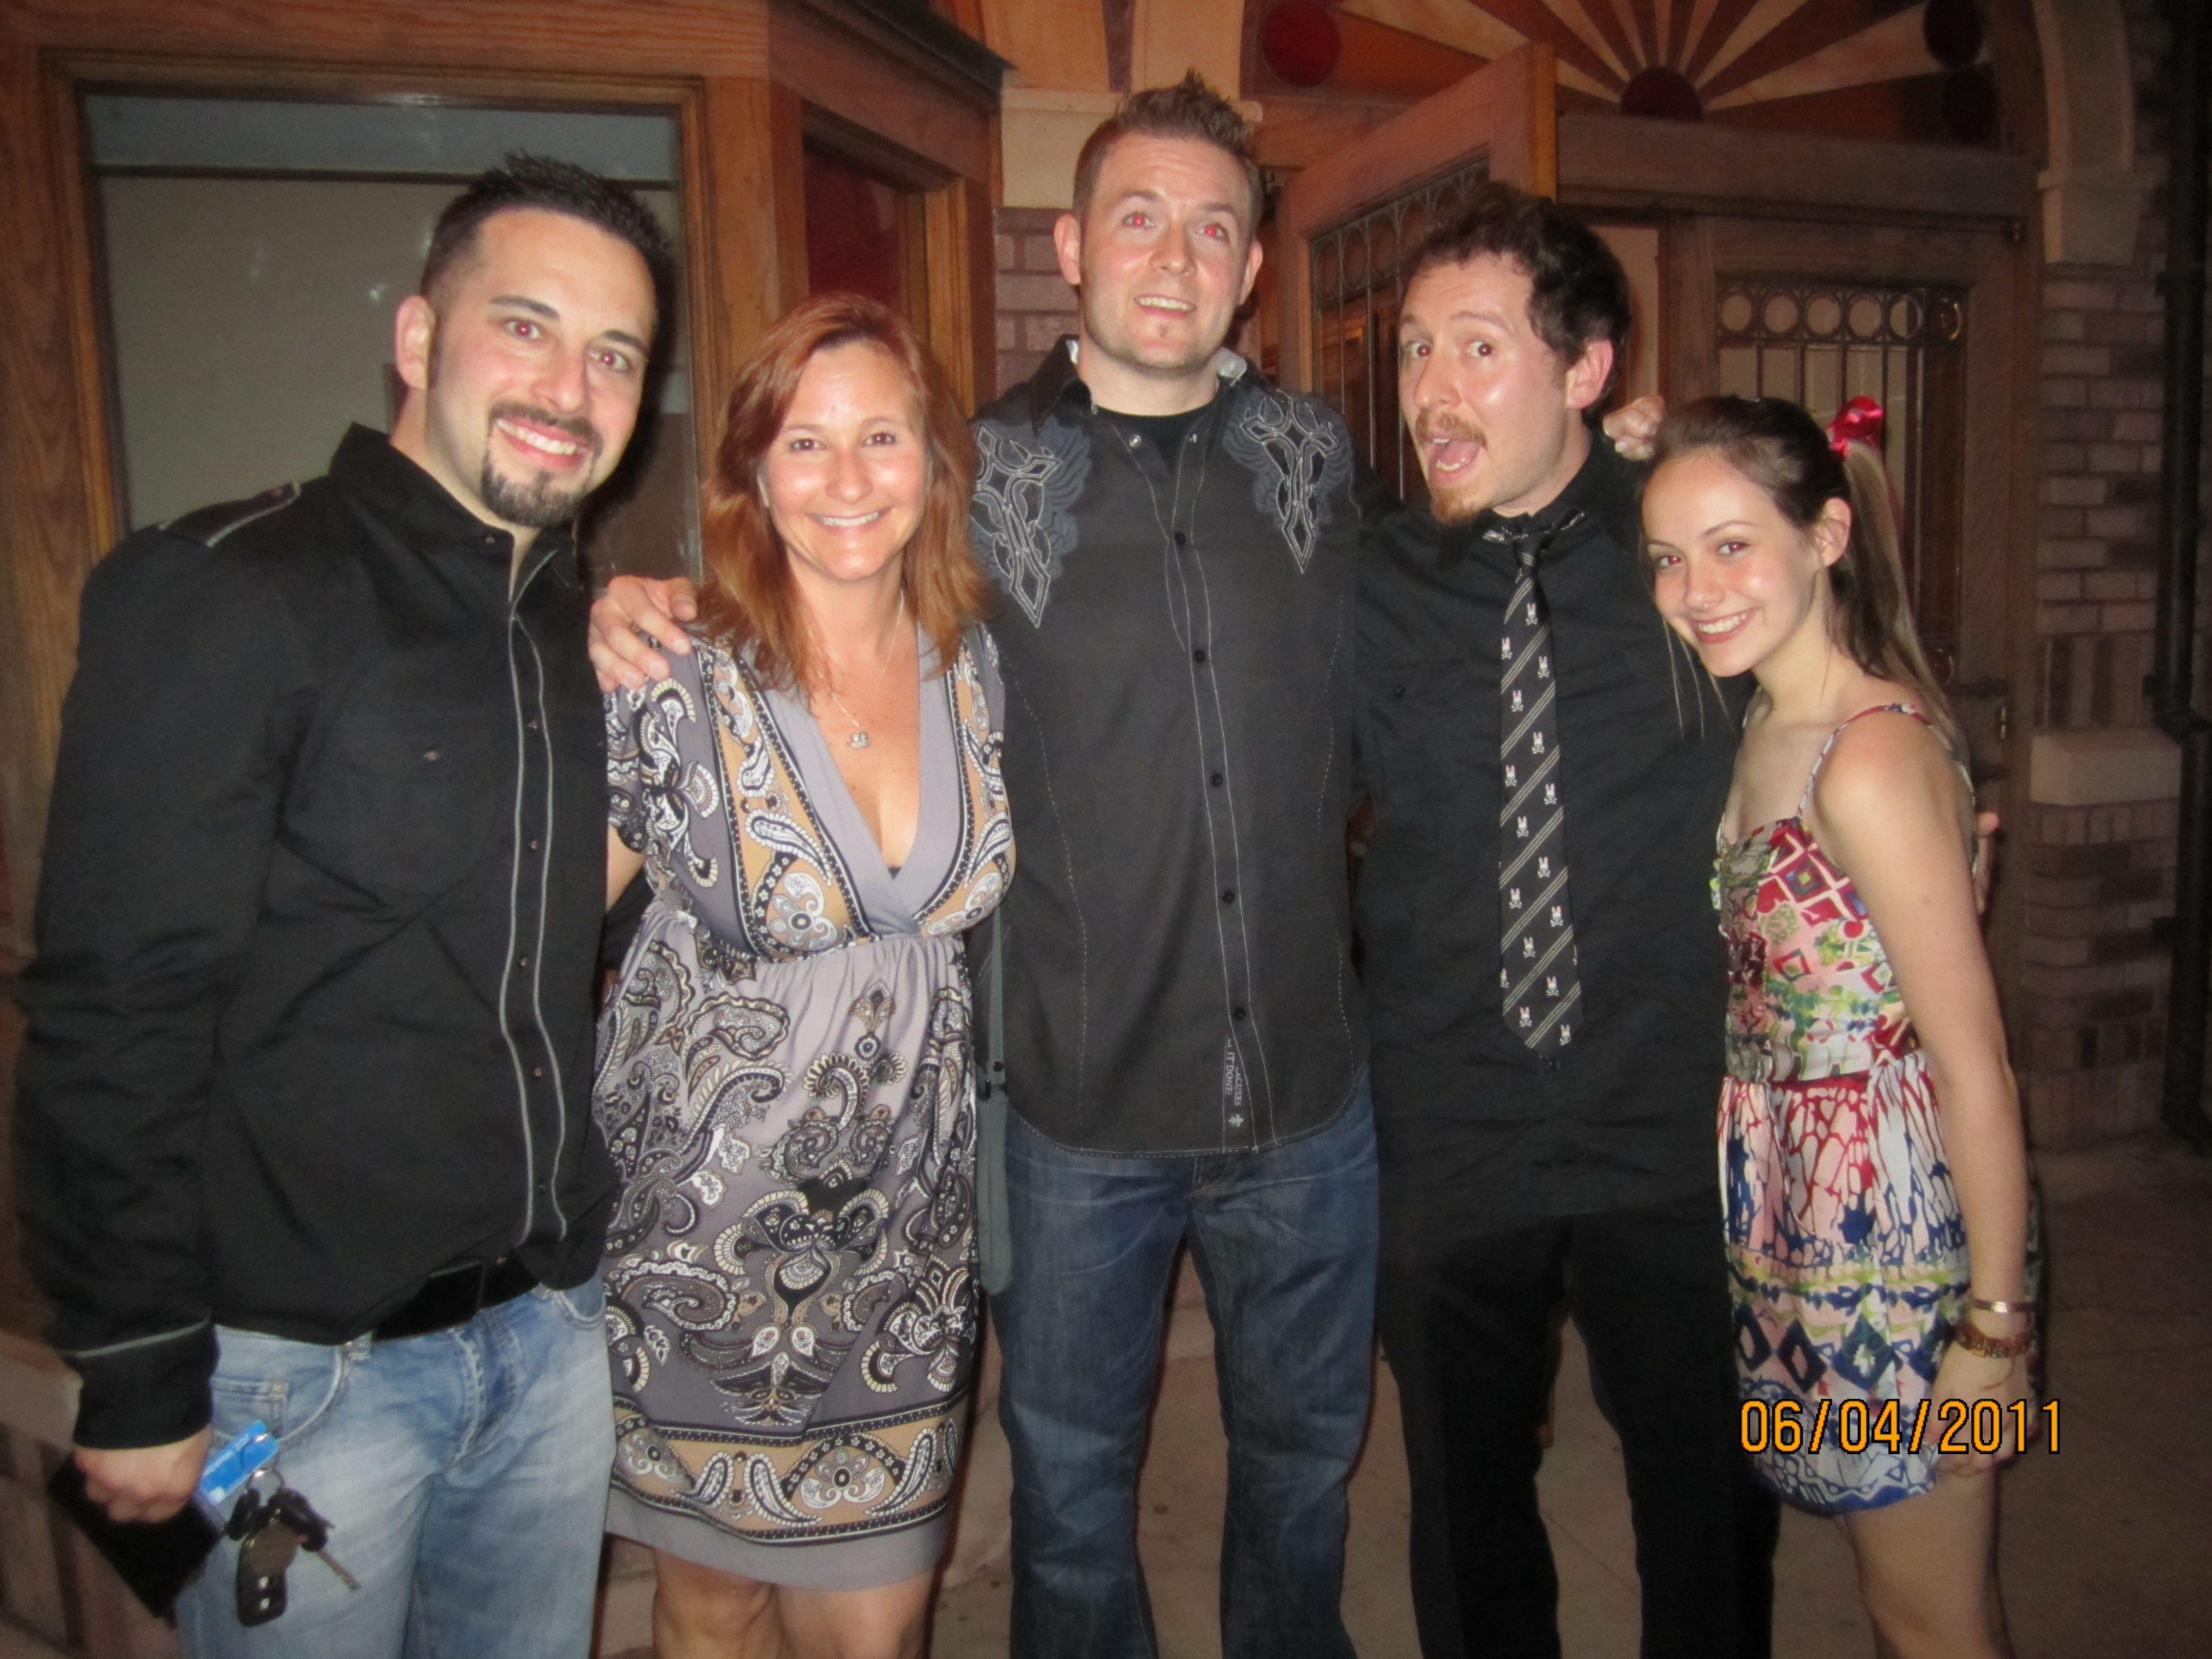 June 2011 - 'Cassadaga' Cast & Crew screening with Producer Scott Poiley, Writer Bruce Wood, Director Anthony DiBlasi, Actress Sarah Sculco